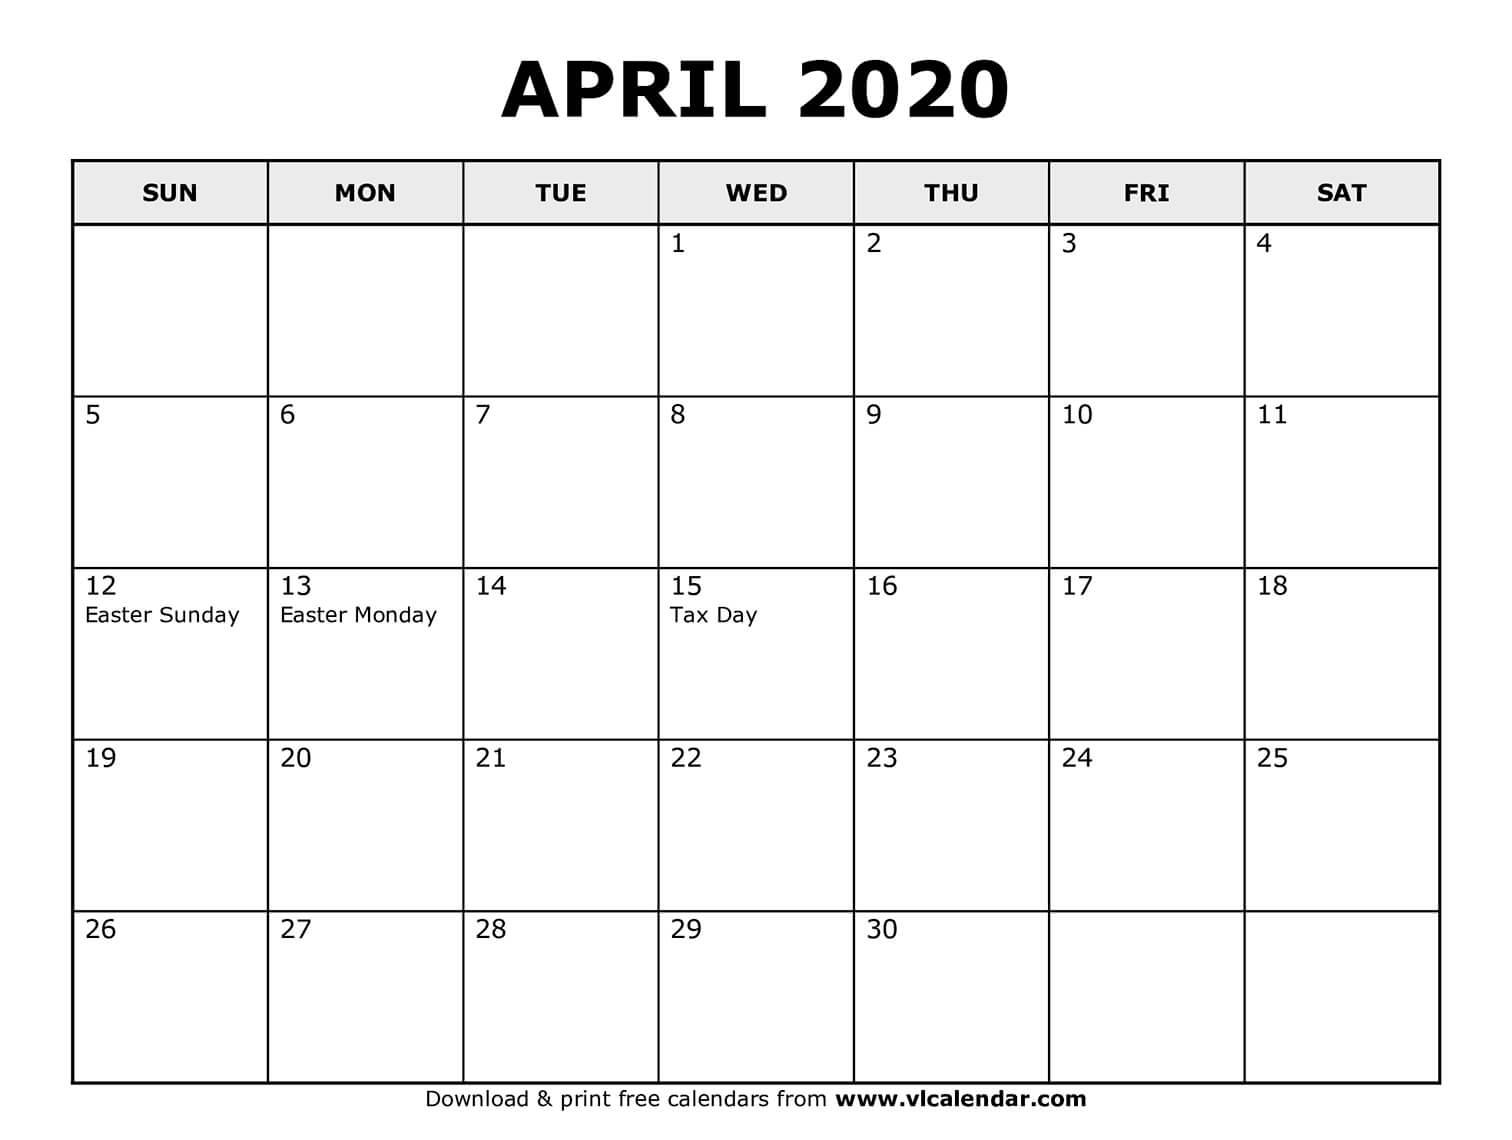 April 2020 - calendar templates for Word, Excel and PDF  |April 2020 Calendar